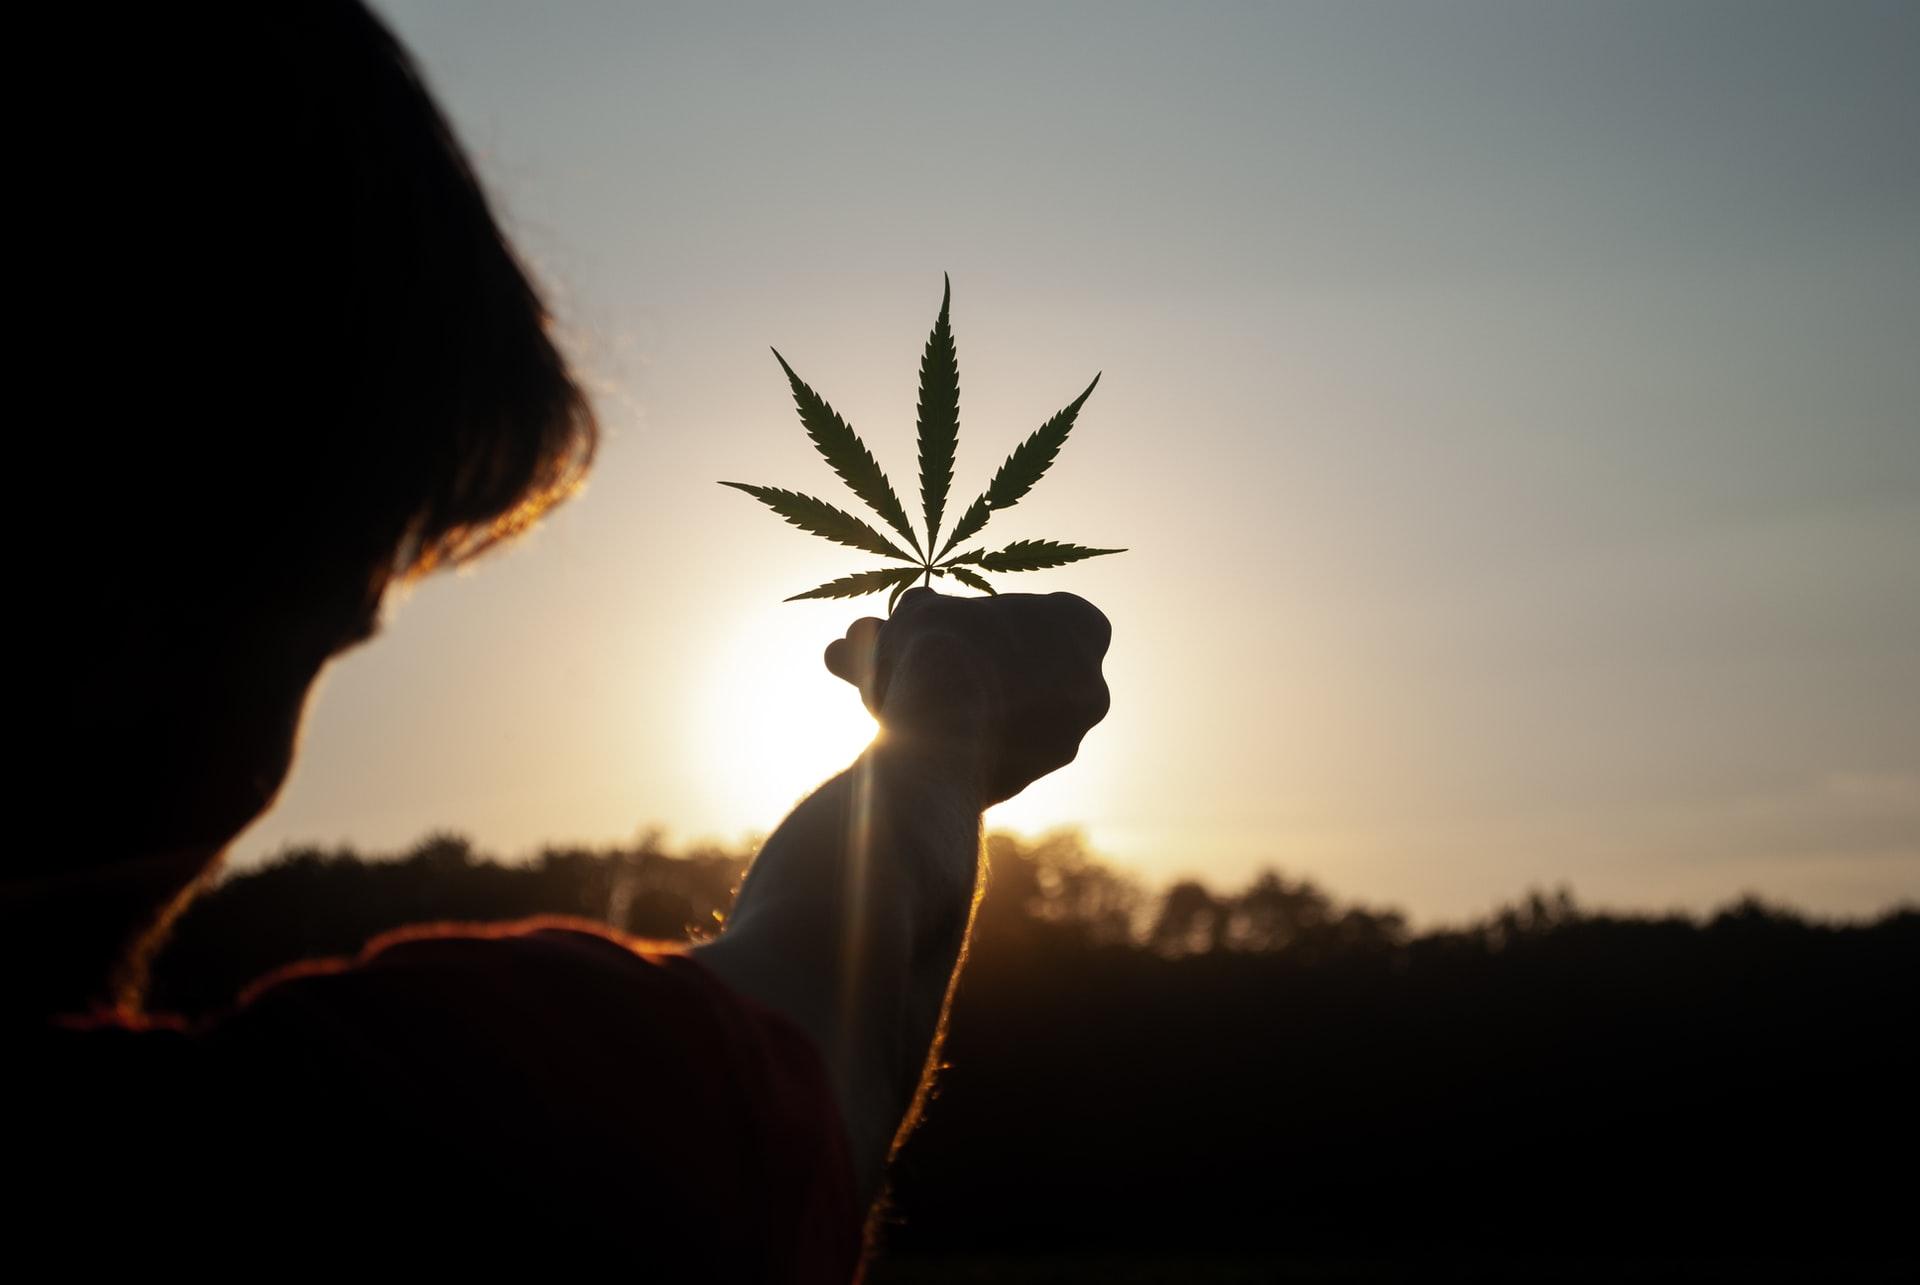 david gabric KdC5agsz6ik unsplash 1 - What's New on the Cannabis Market in 2021?